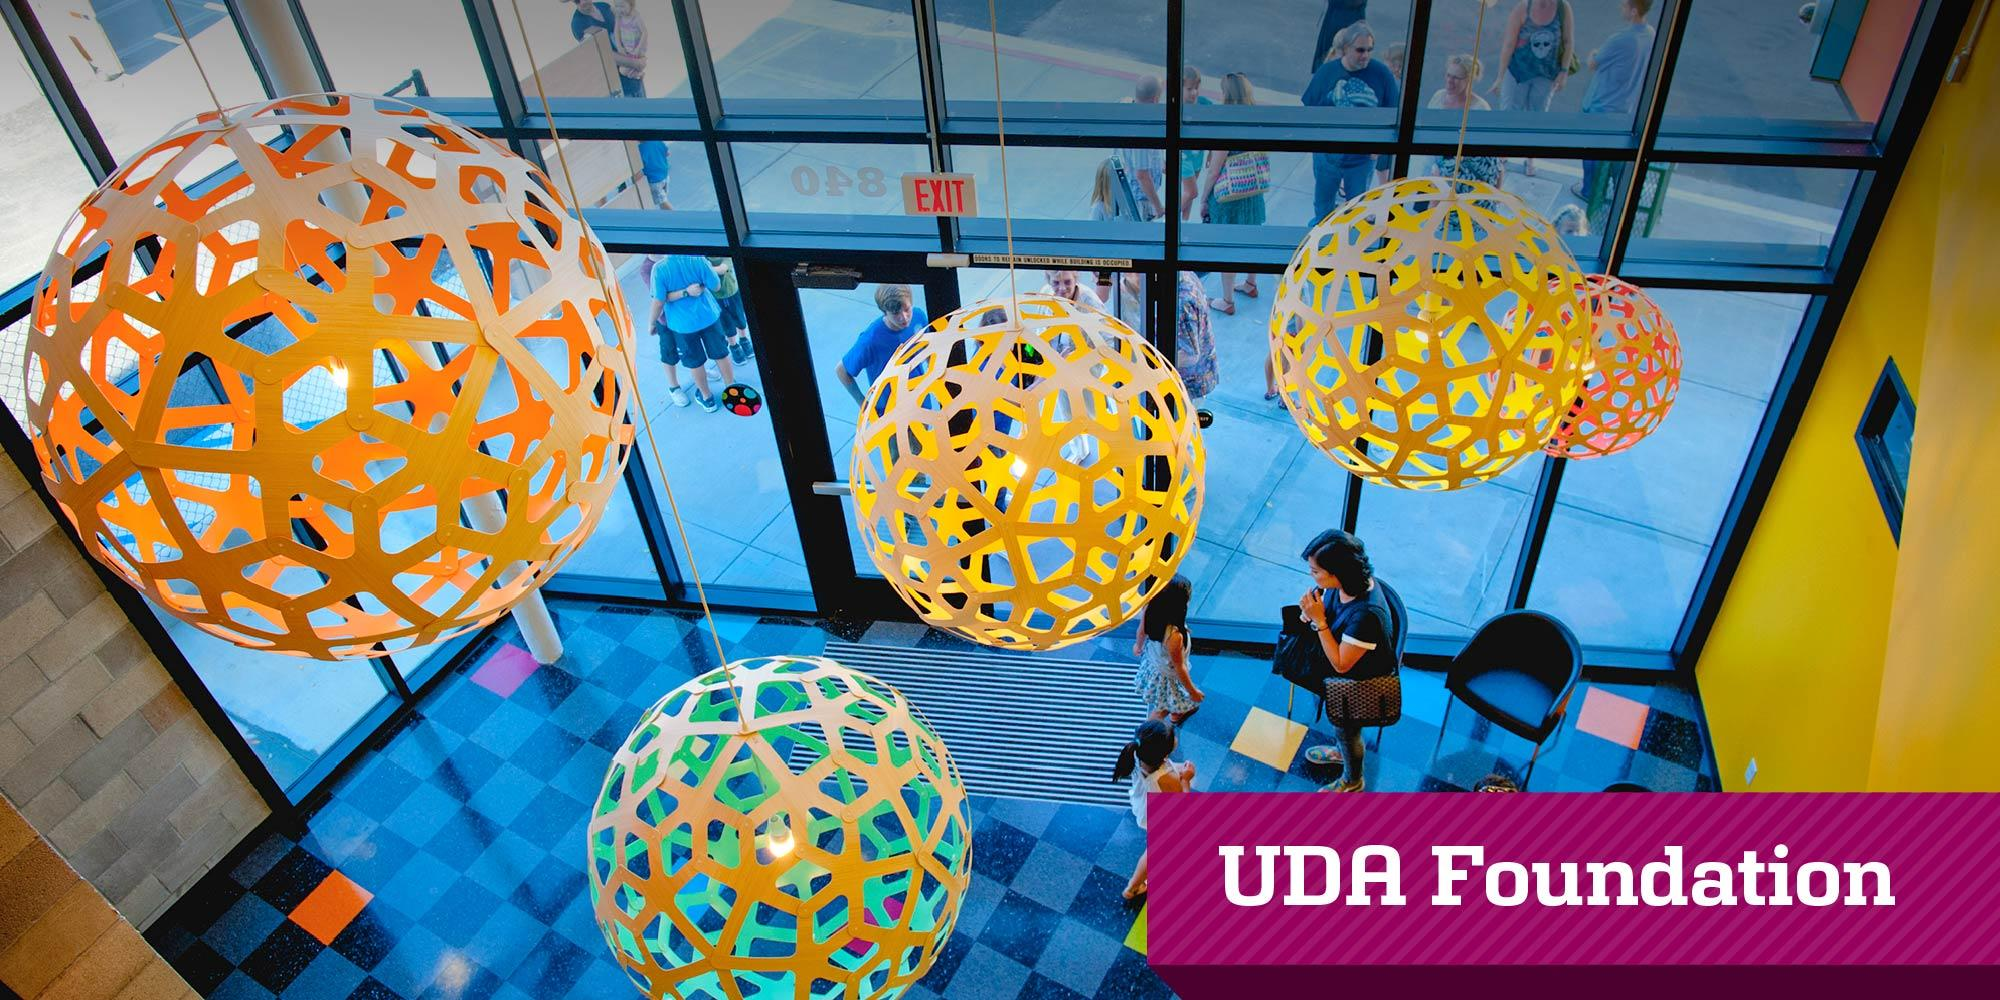 Urban Discovery Schools - The UDA Foundation